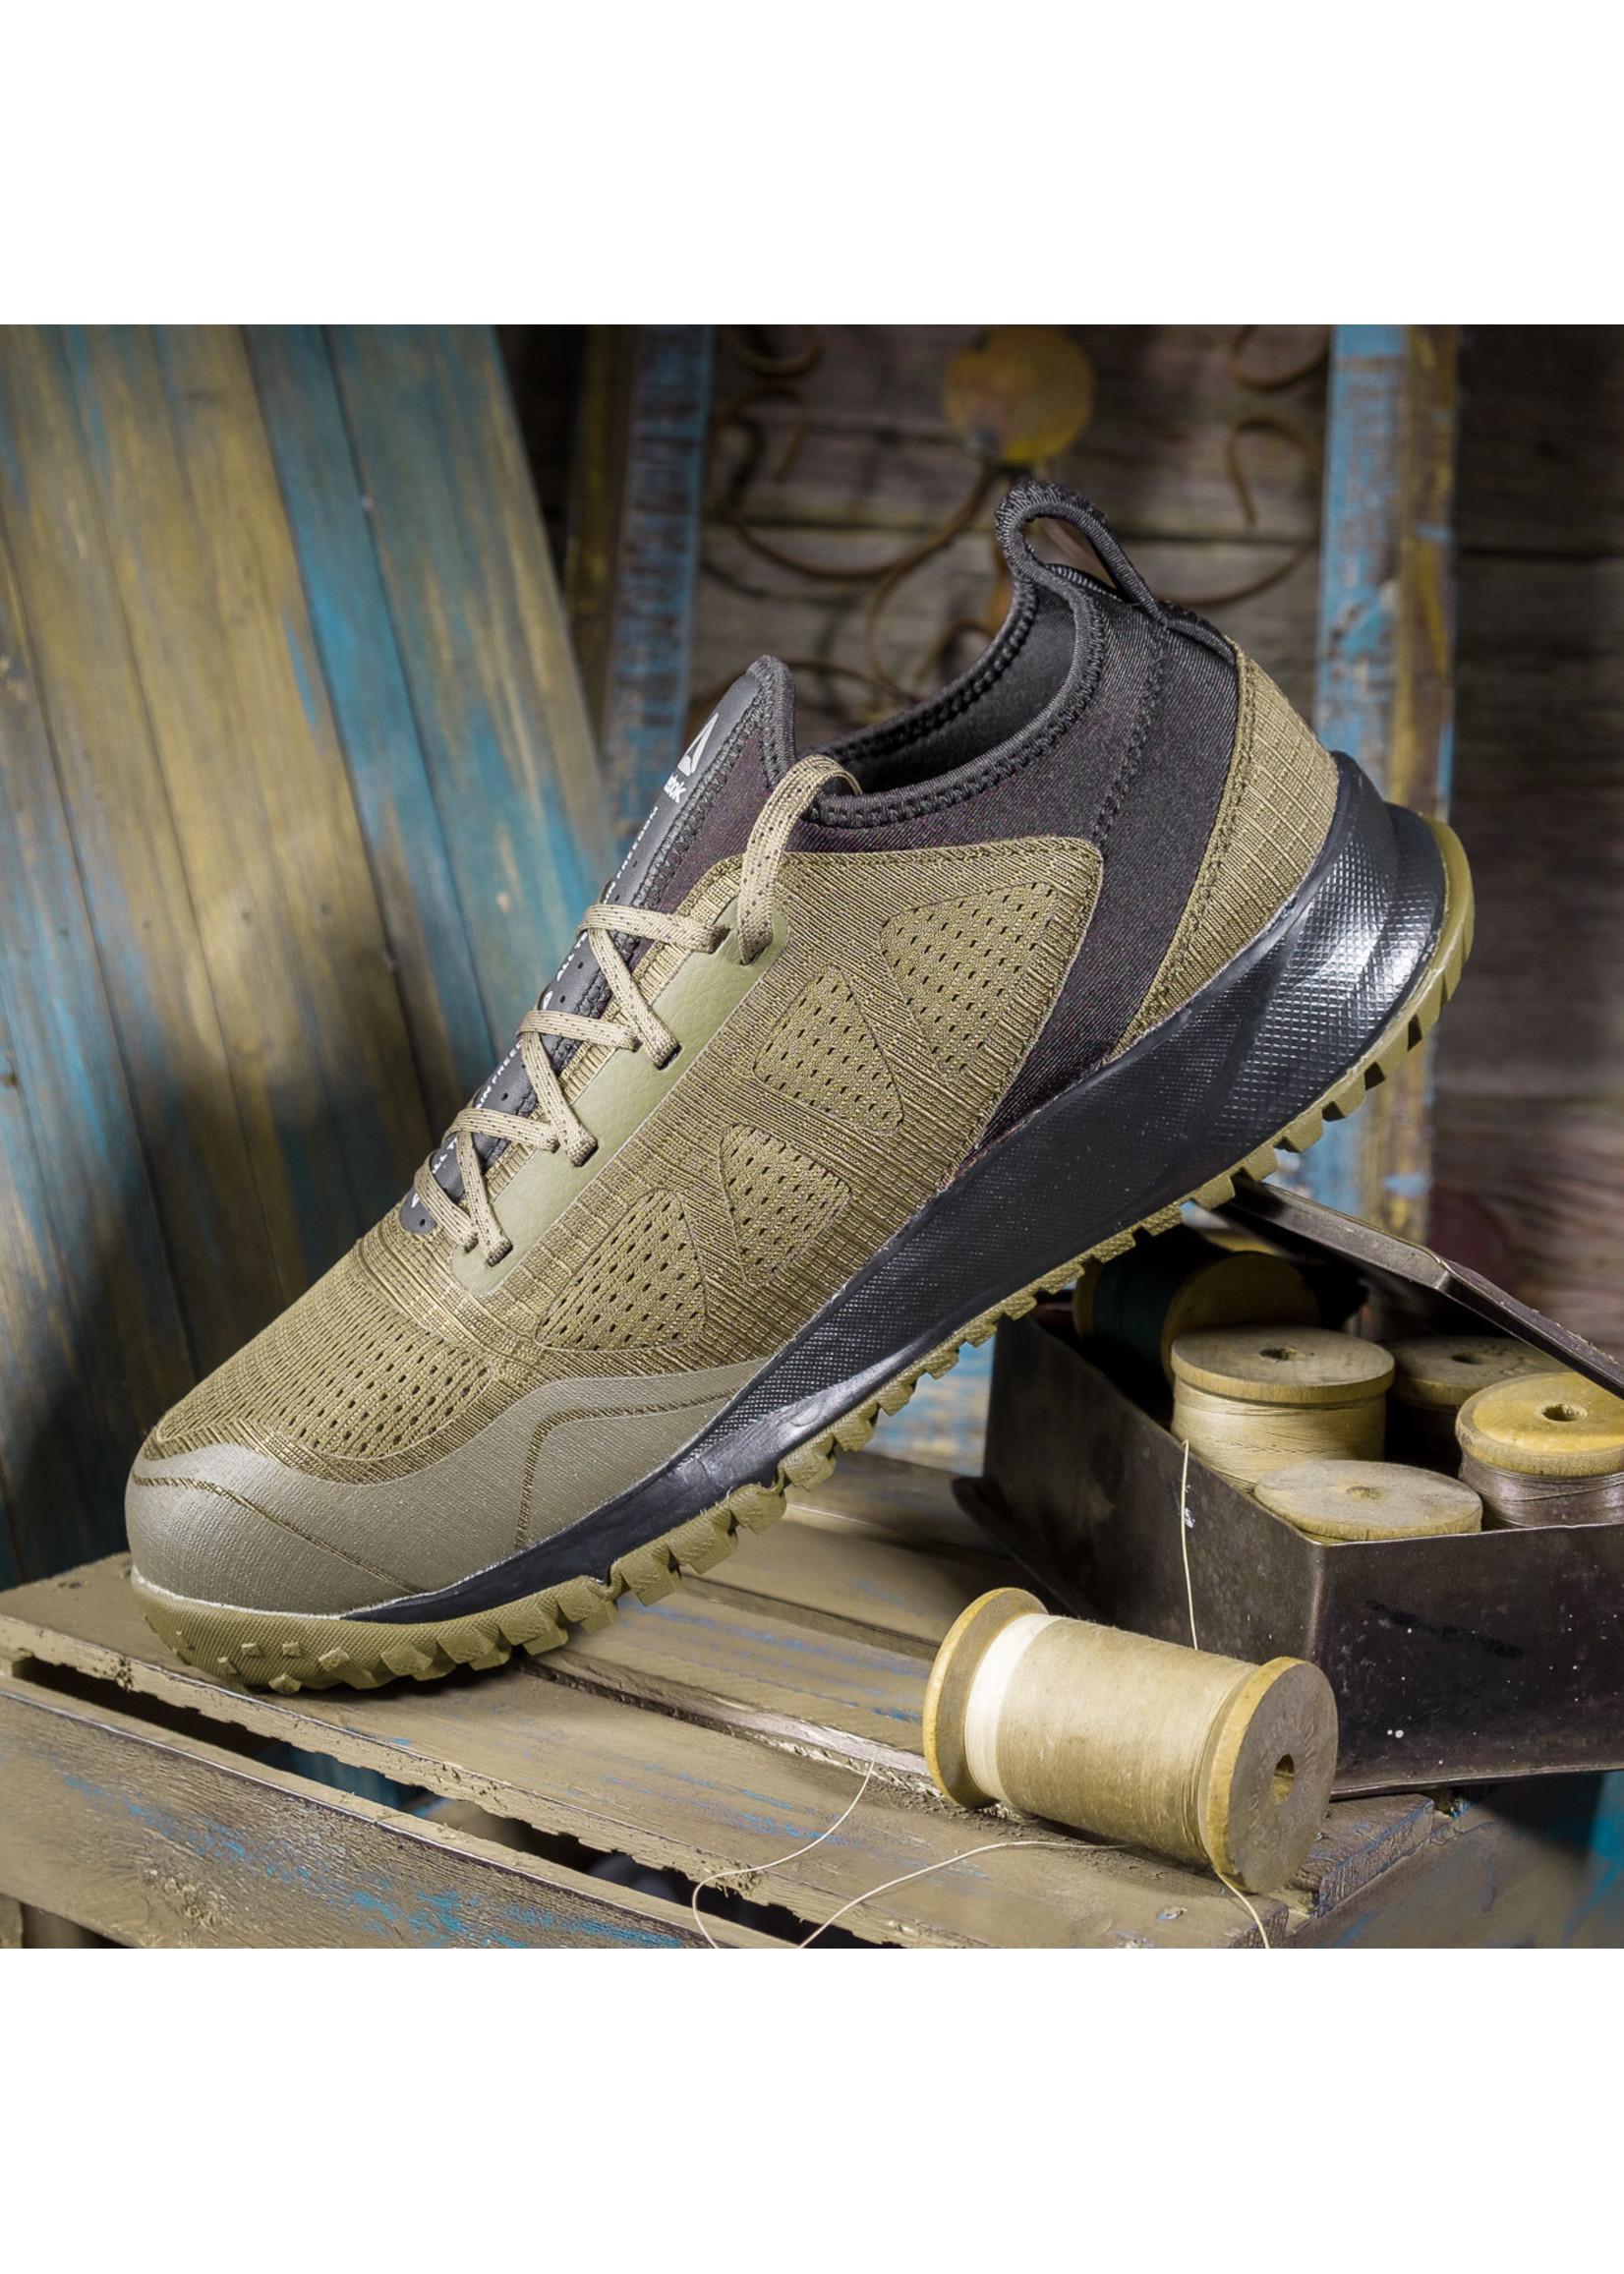 Reebok Men's All Terrain Green/Black Work ST Shoes RB4092